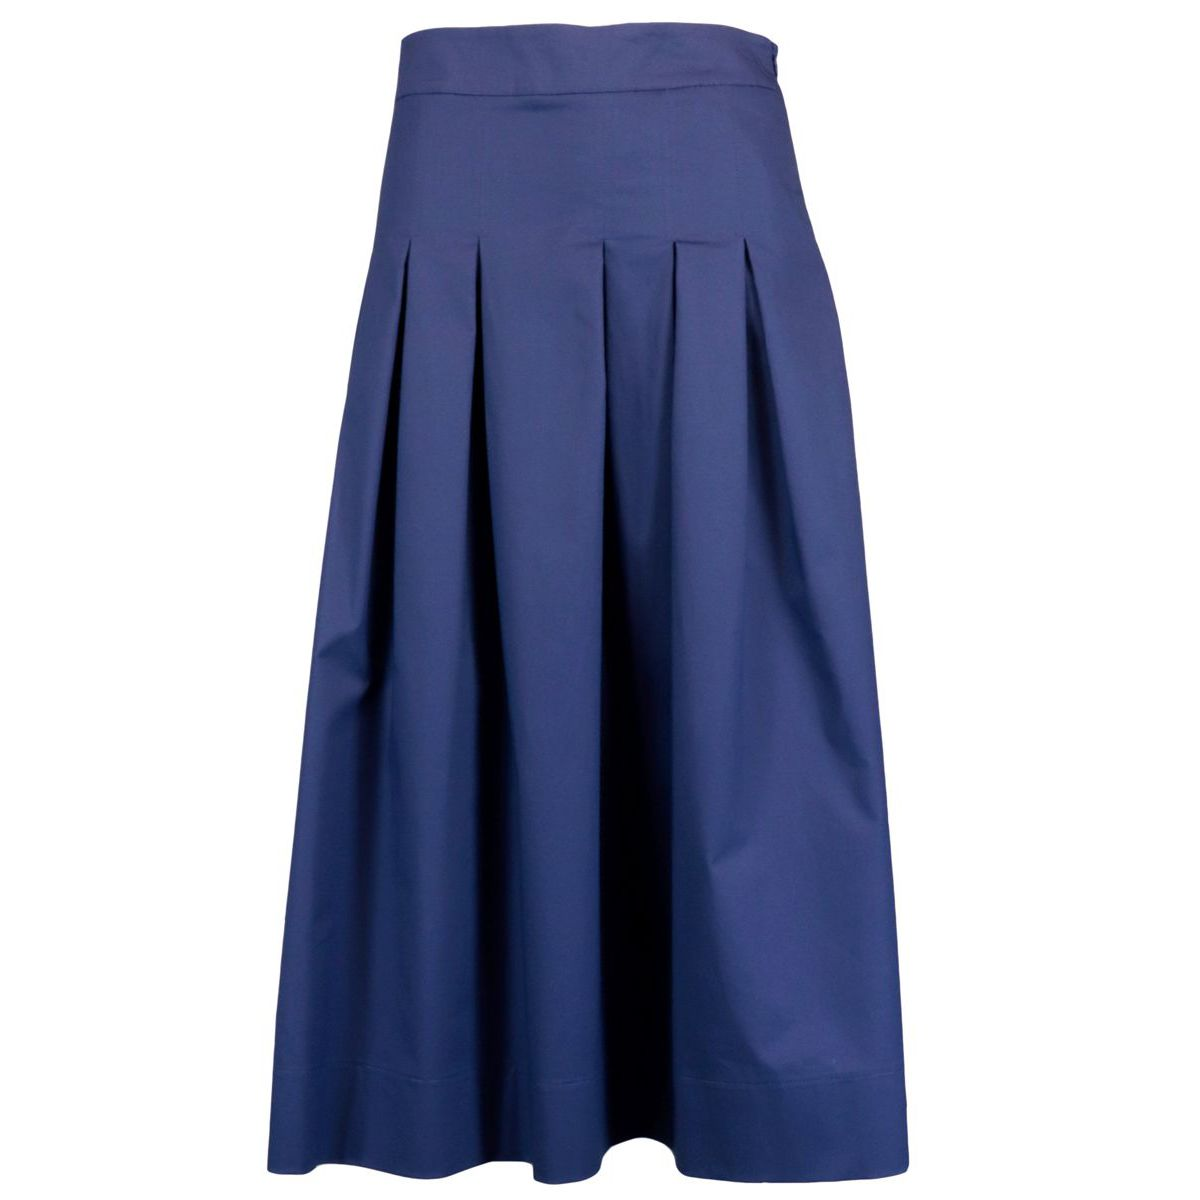 Cotton skirt with stitched pleats Indigo Alpha Studio